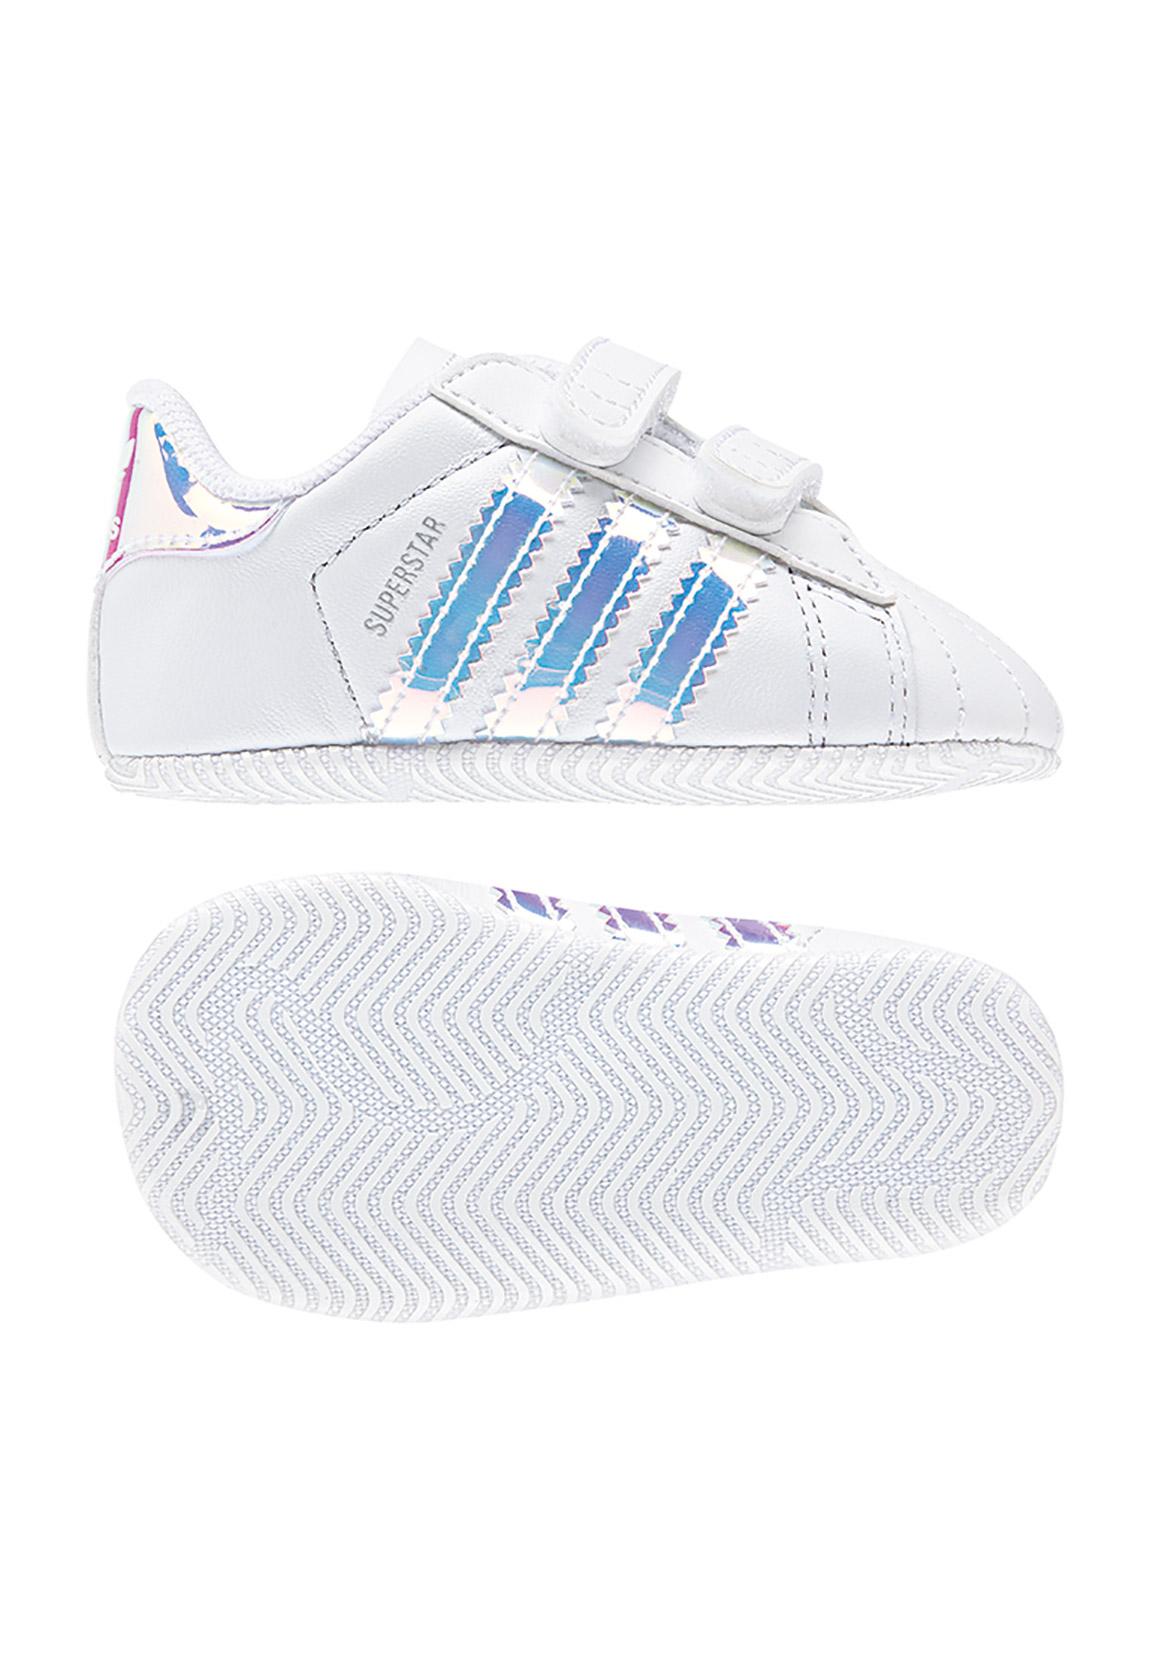 pretty nice 2c1c7 4a0de Adidas Babyschuhe SUPERSTAR CRIB BD8000 Weiss